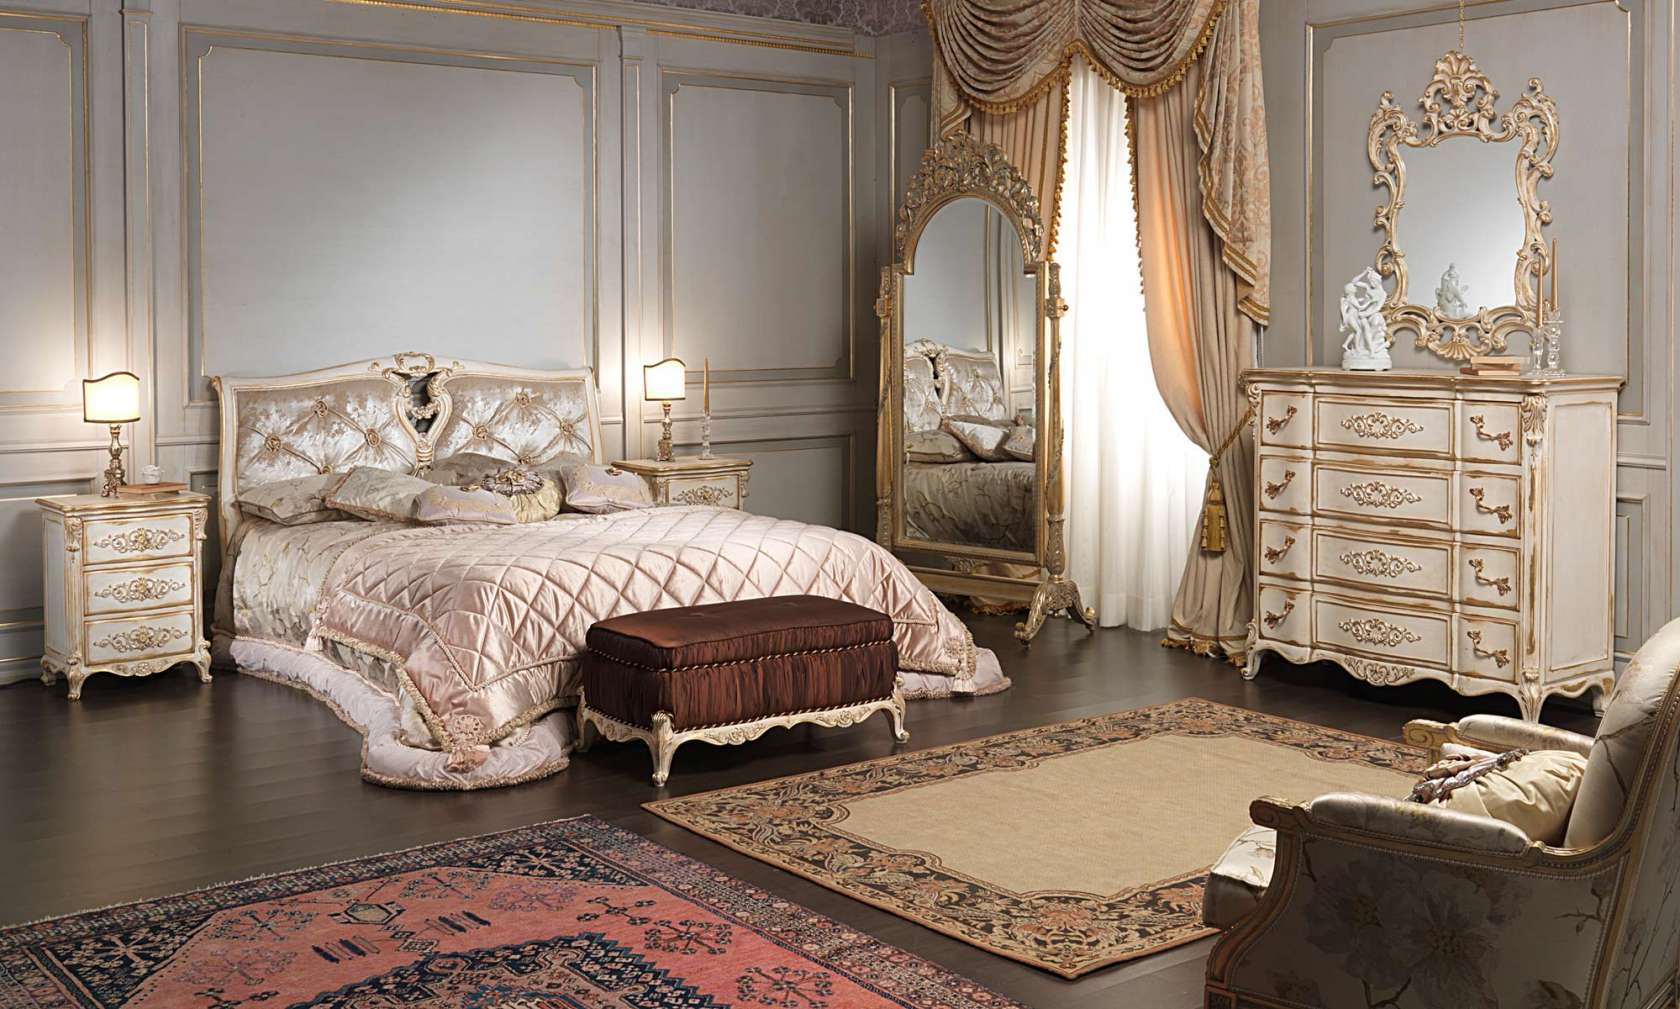 Camera da letto classica in stile Luigi XVI, letto, panca imbottita ...